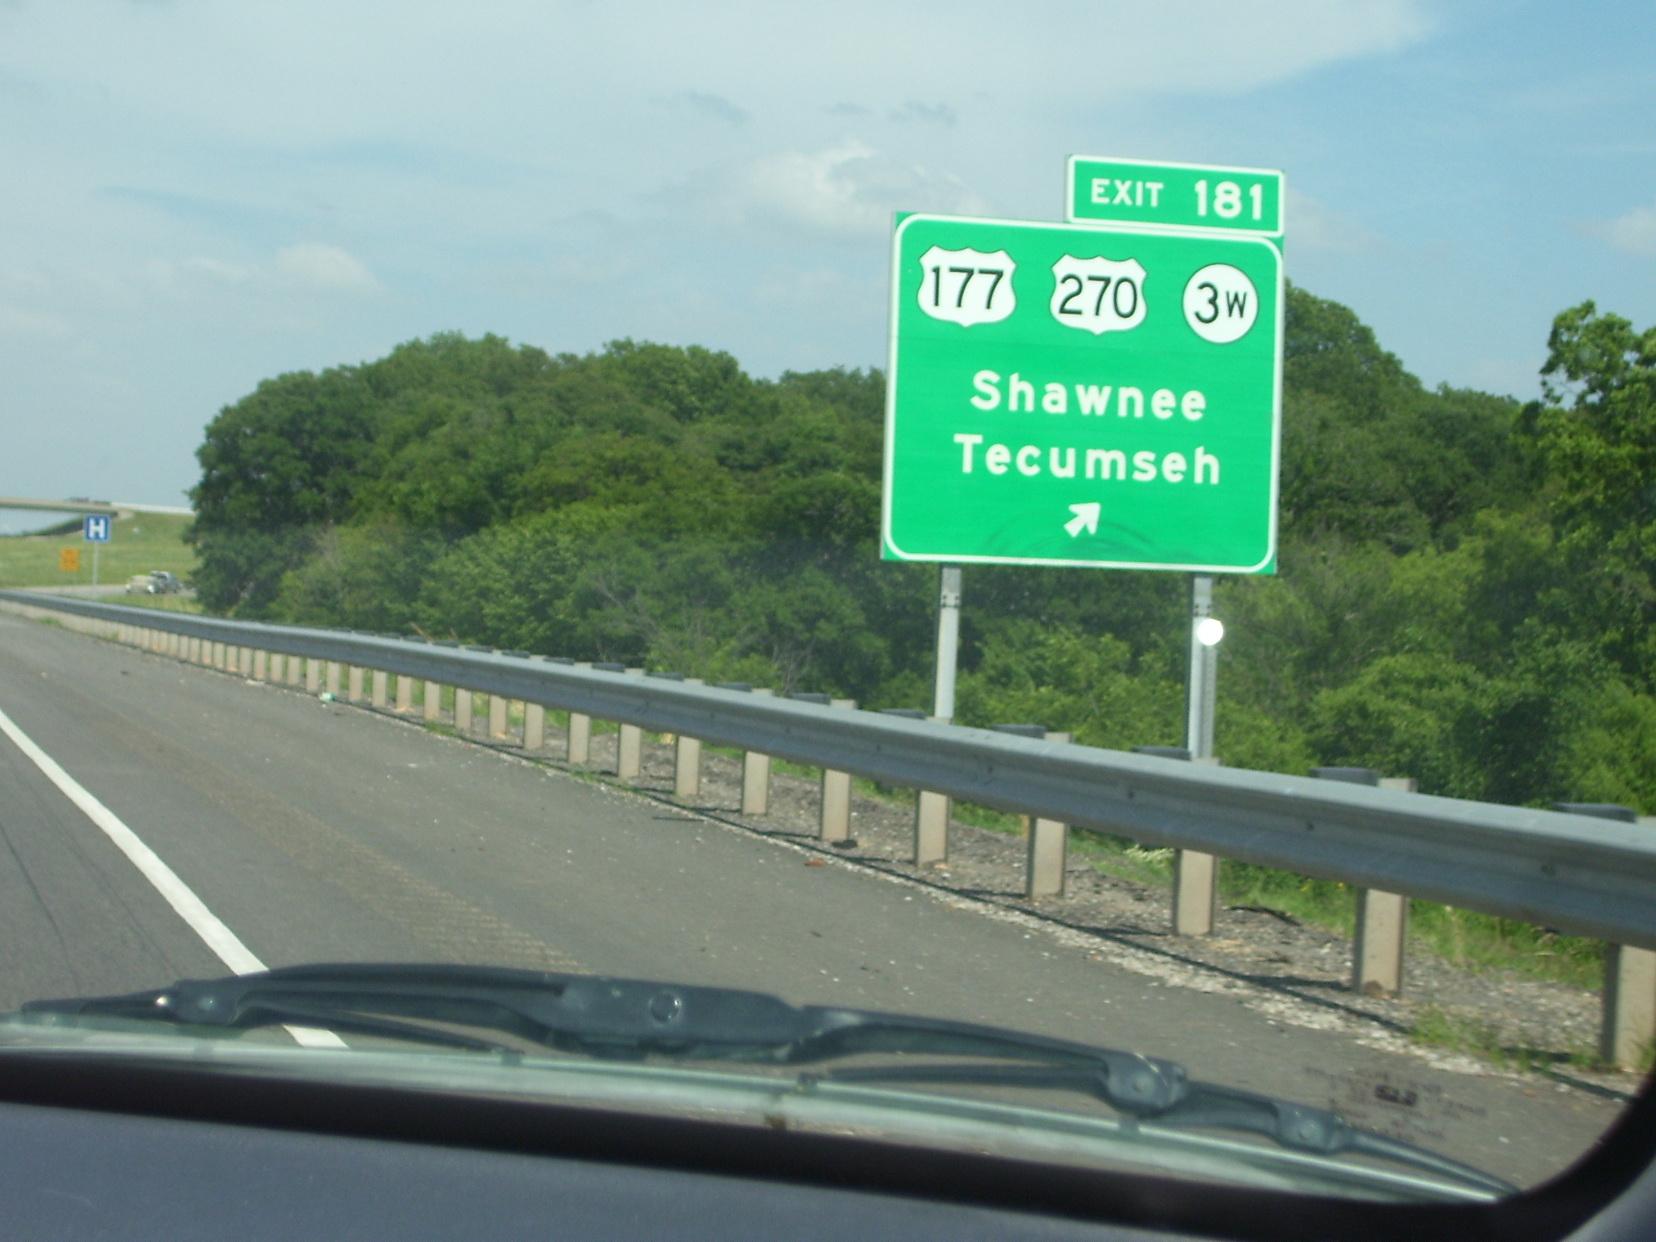 Exit 181